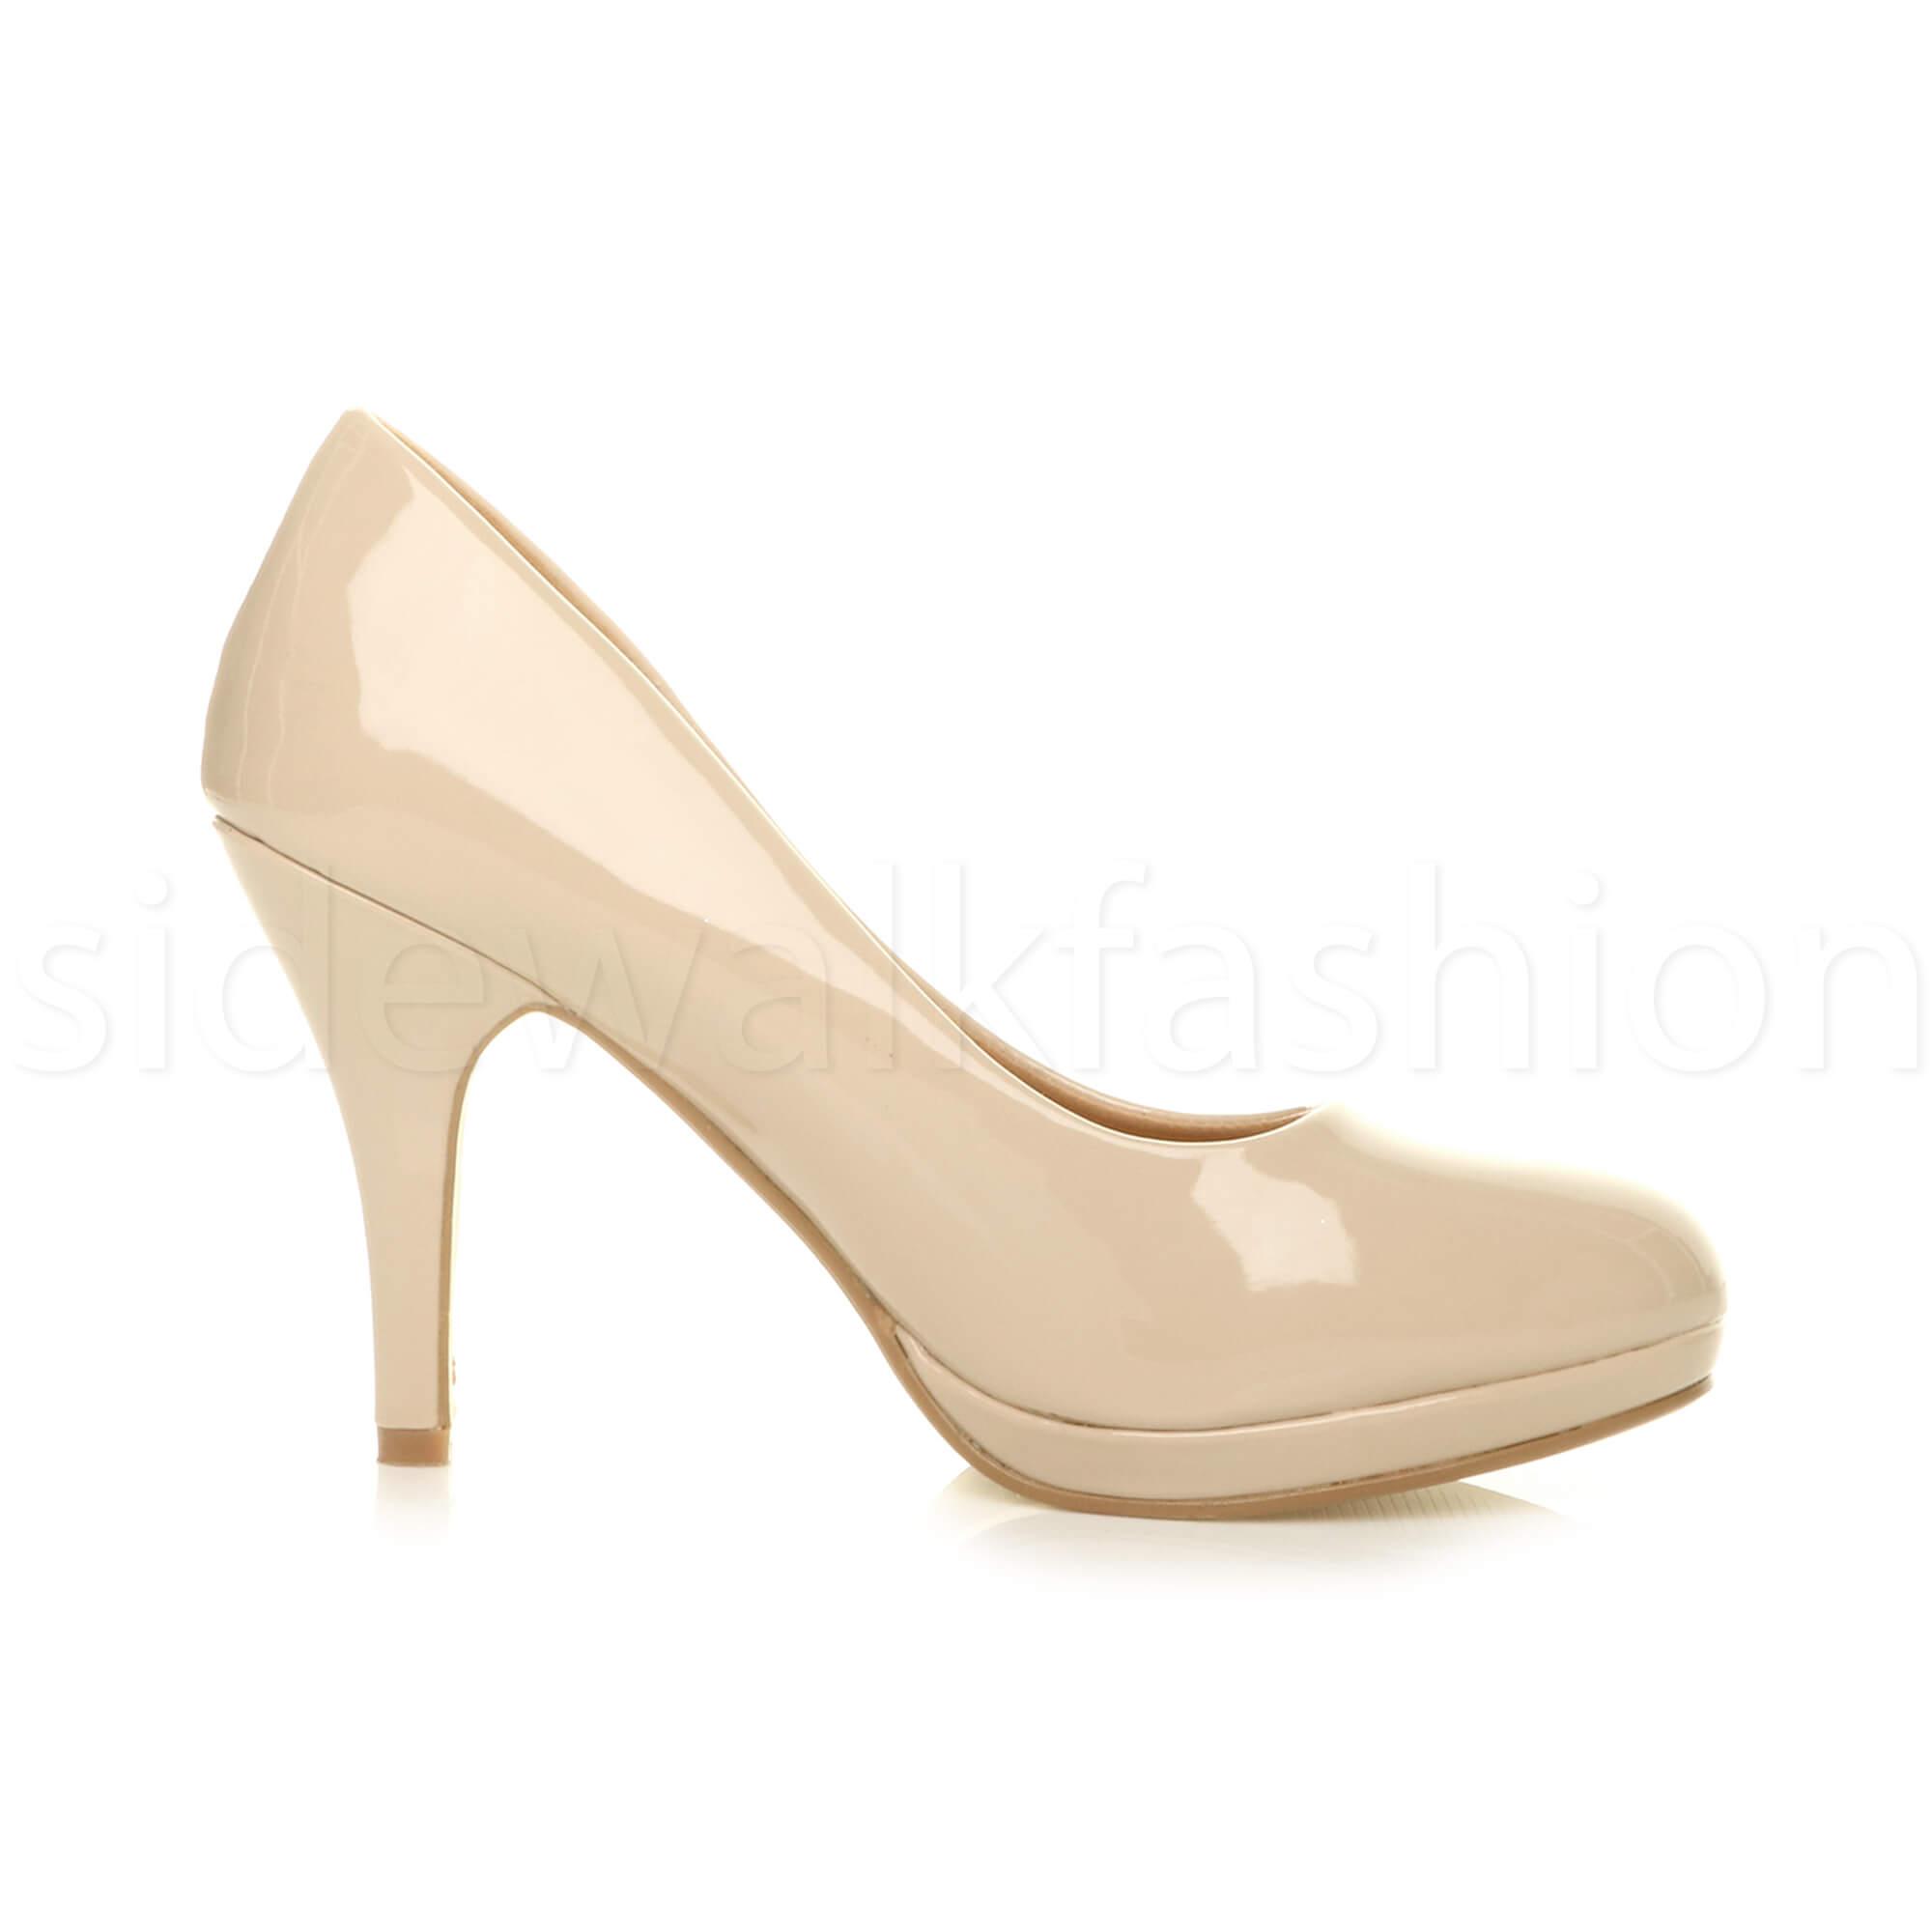 Womens-ladies-high-mid-heel-platform-wedding-evening-bridesmaid-court-shoes-size thumbnail 123